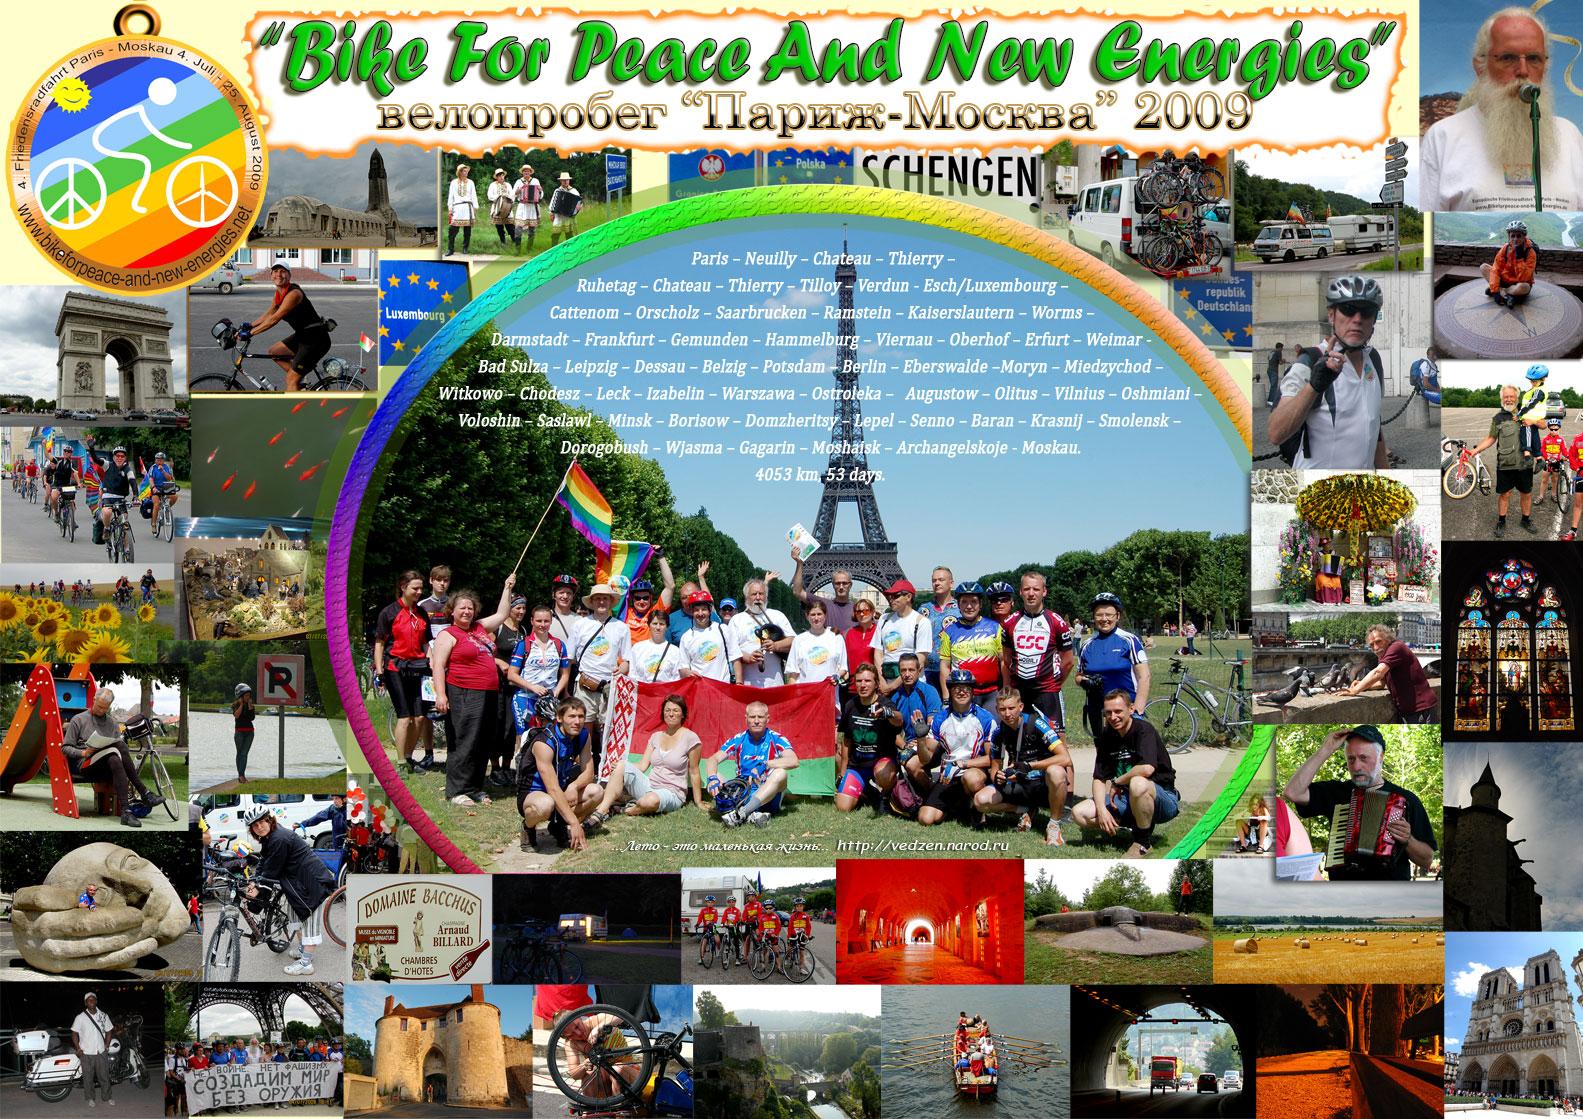 Friedensradfaht 2009 Paris -Moskau